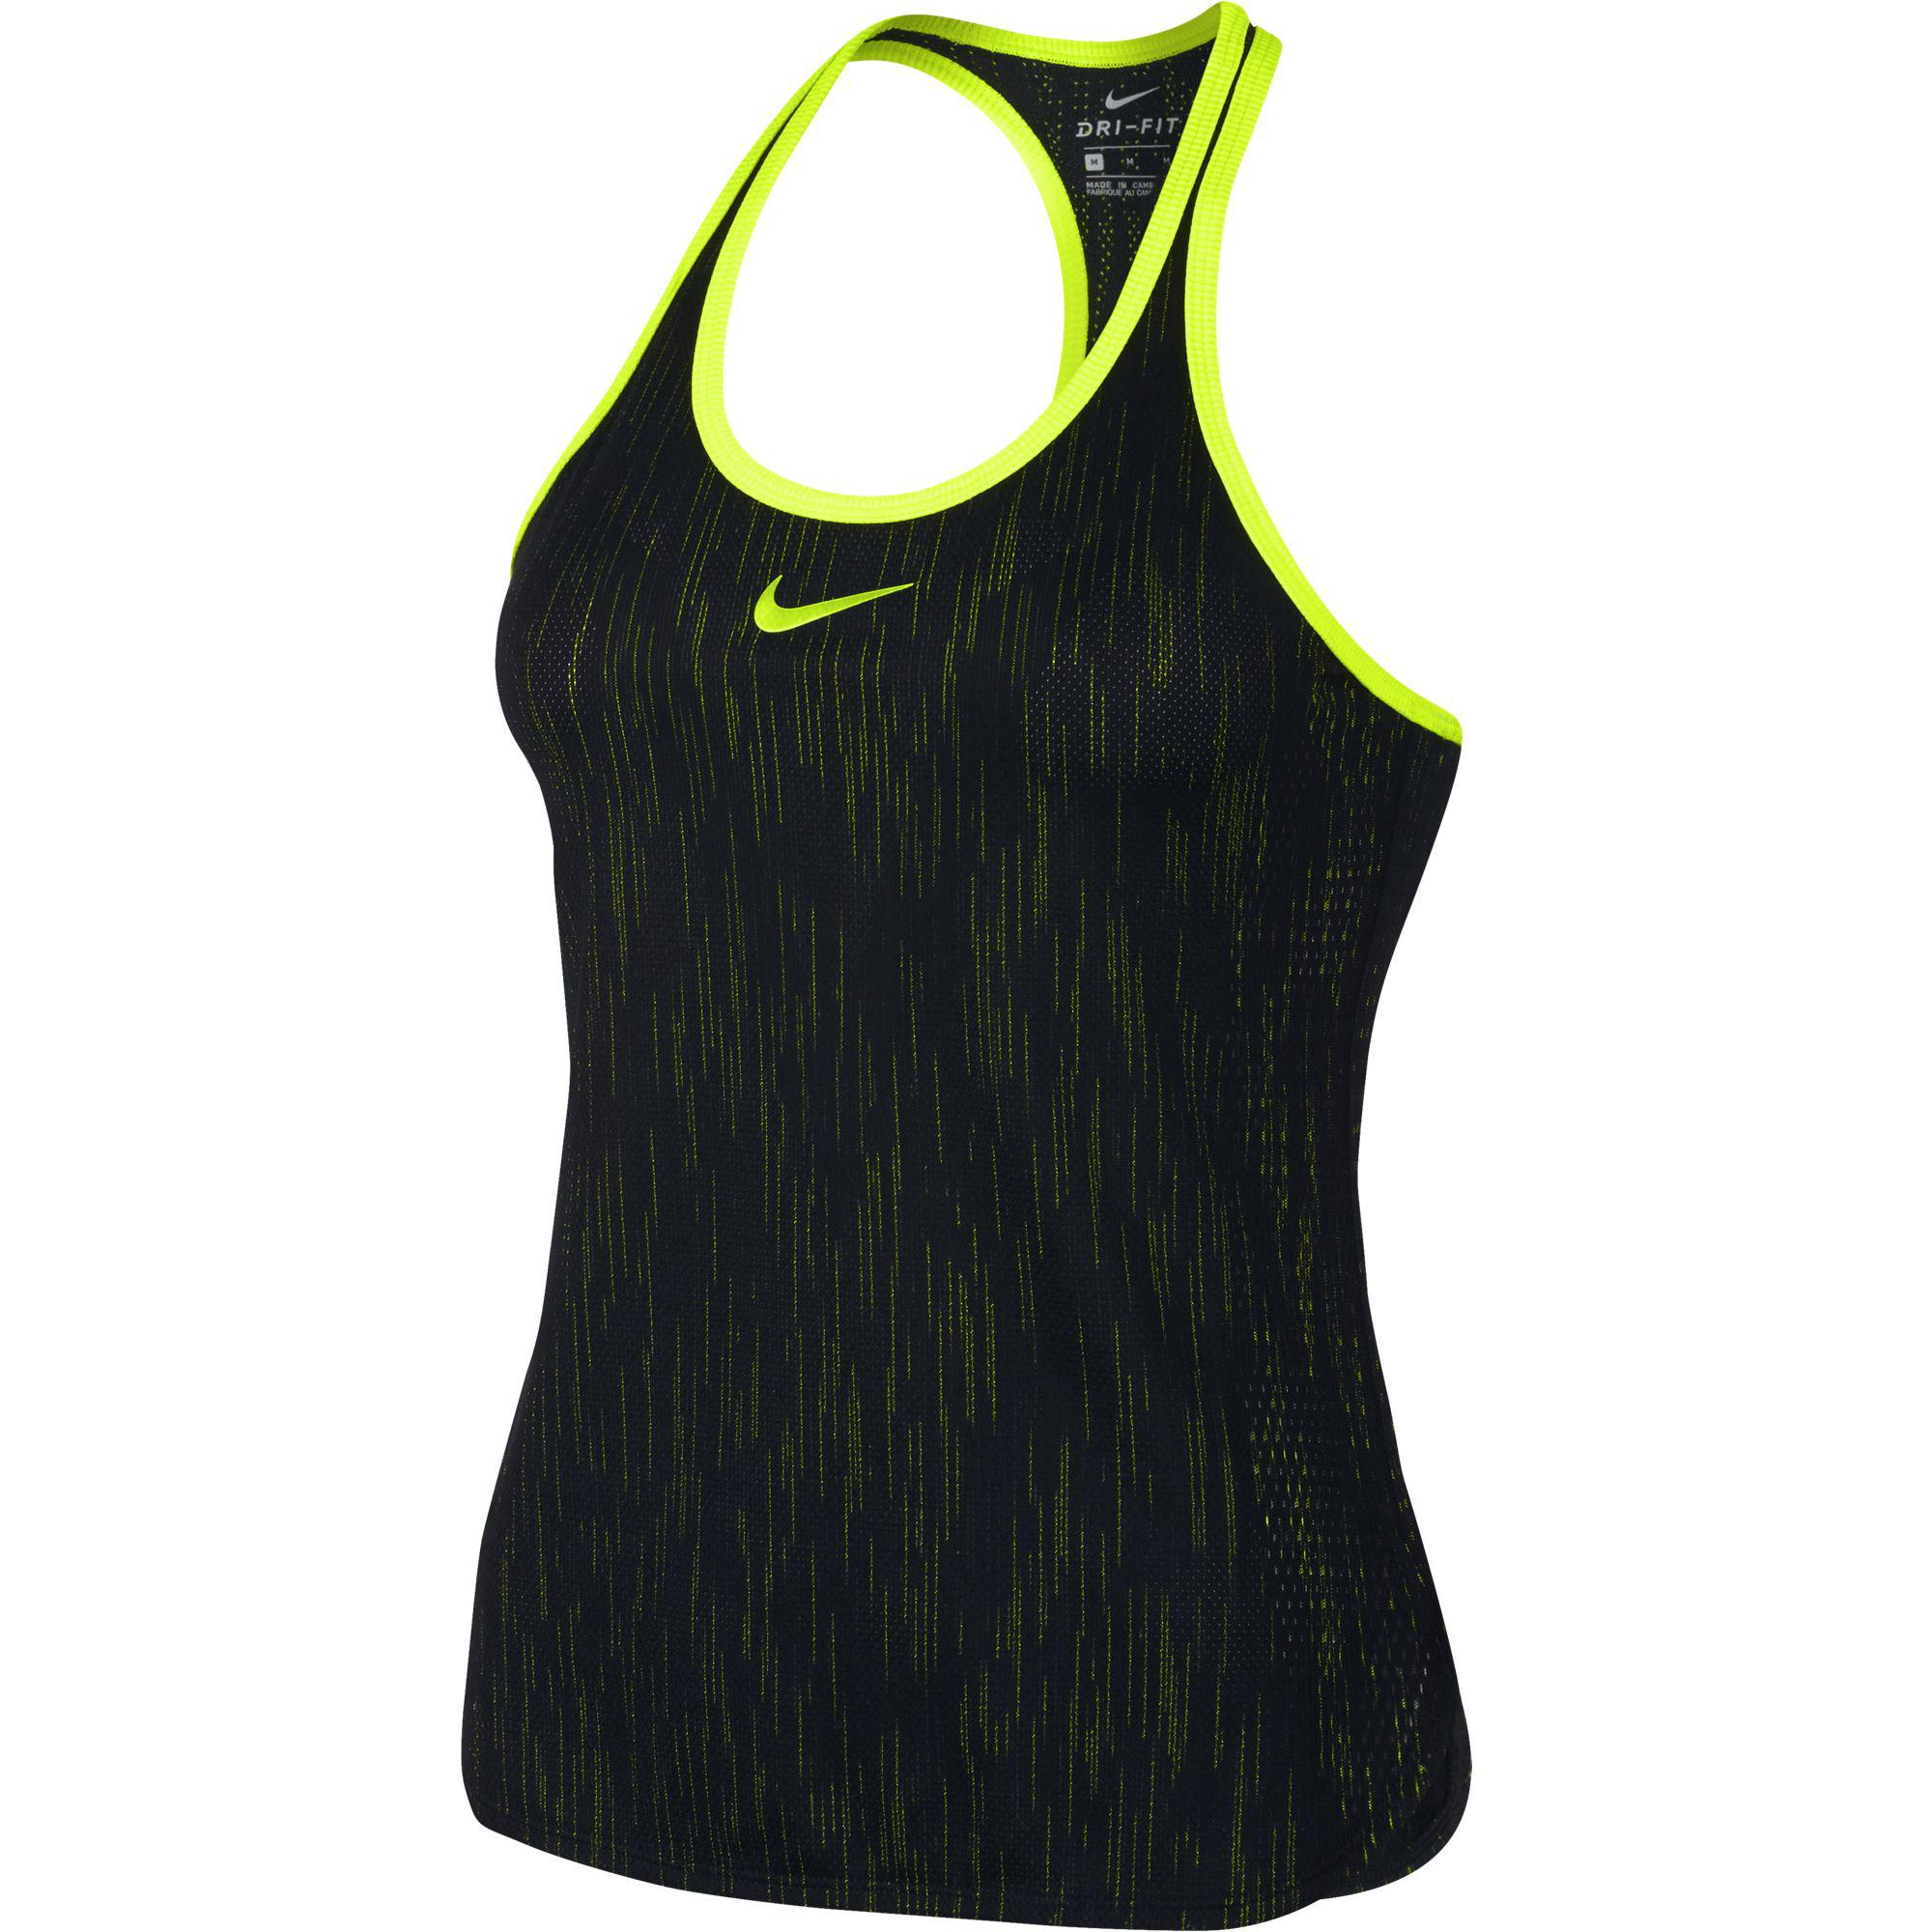 e2a3f47b Nike Womens Flex Dry Slam Tank Top - Black/Volt - Tennisnuts.com